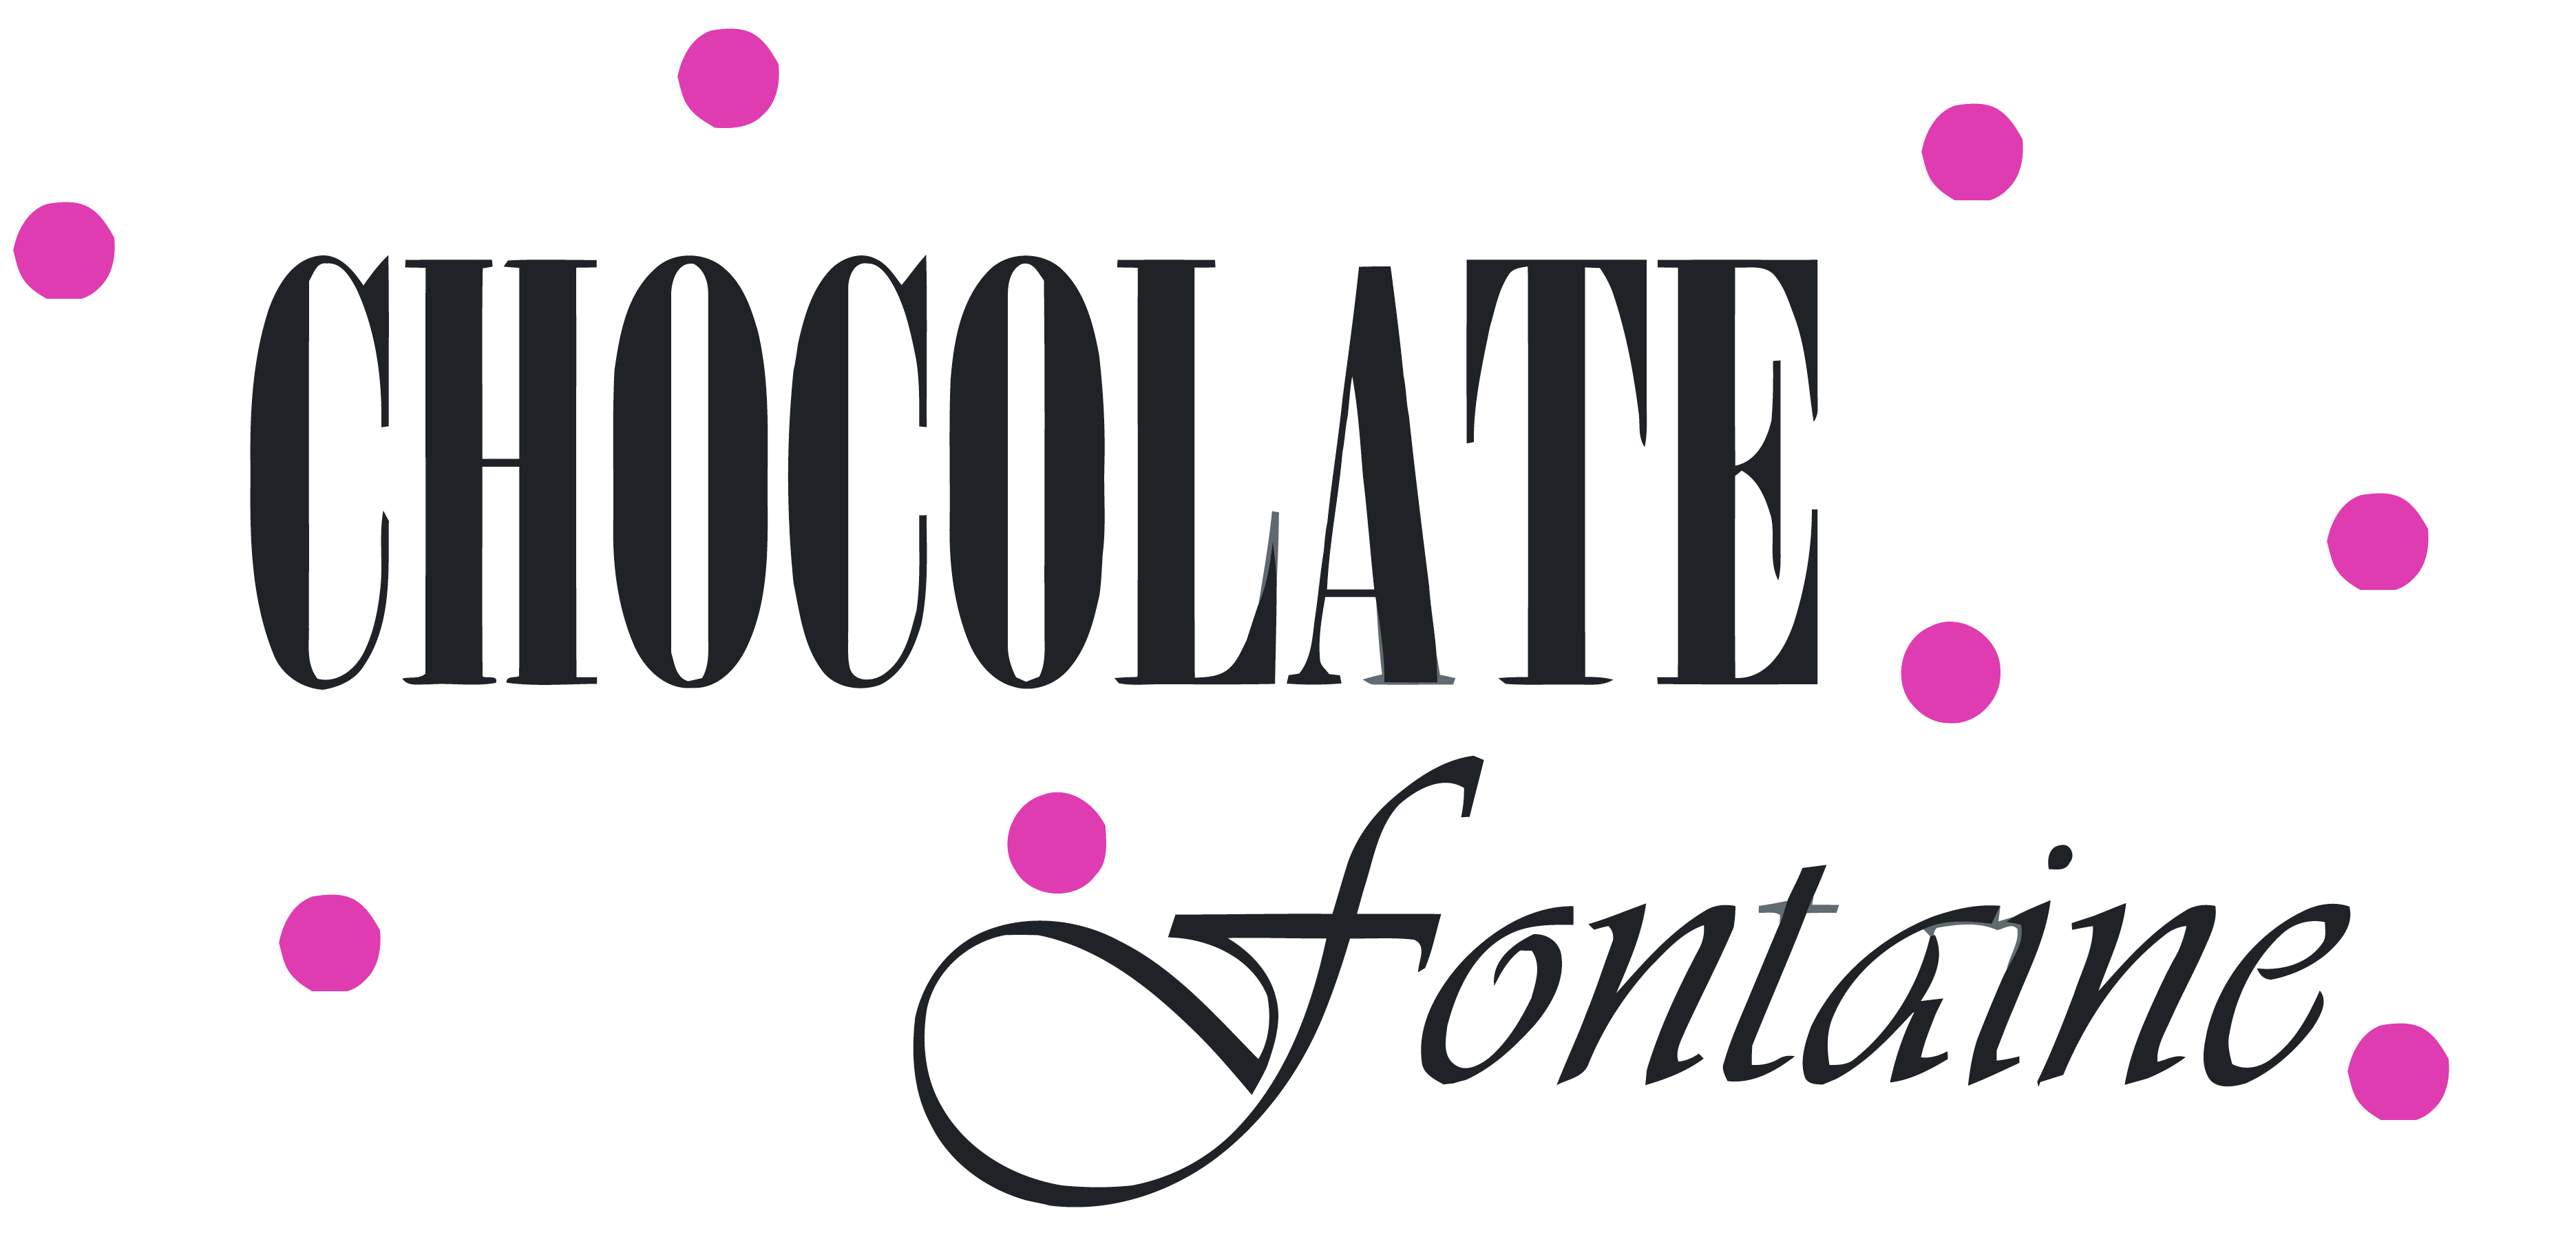 Chocolate Fontaine